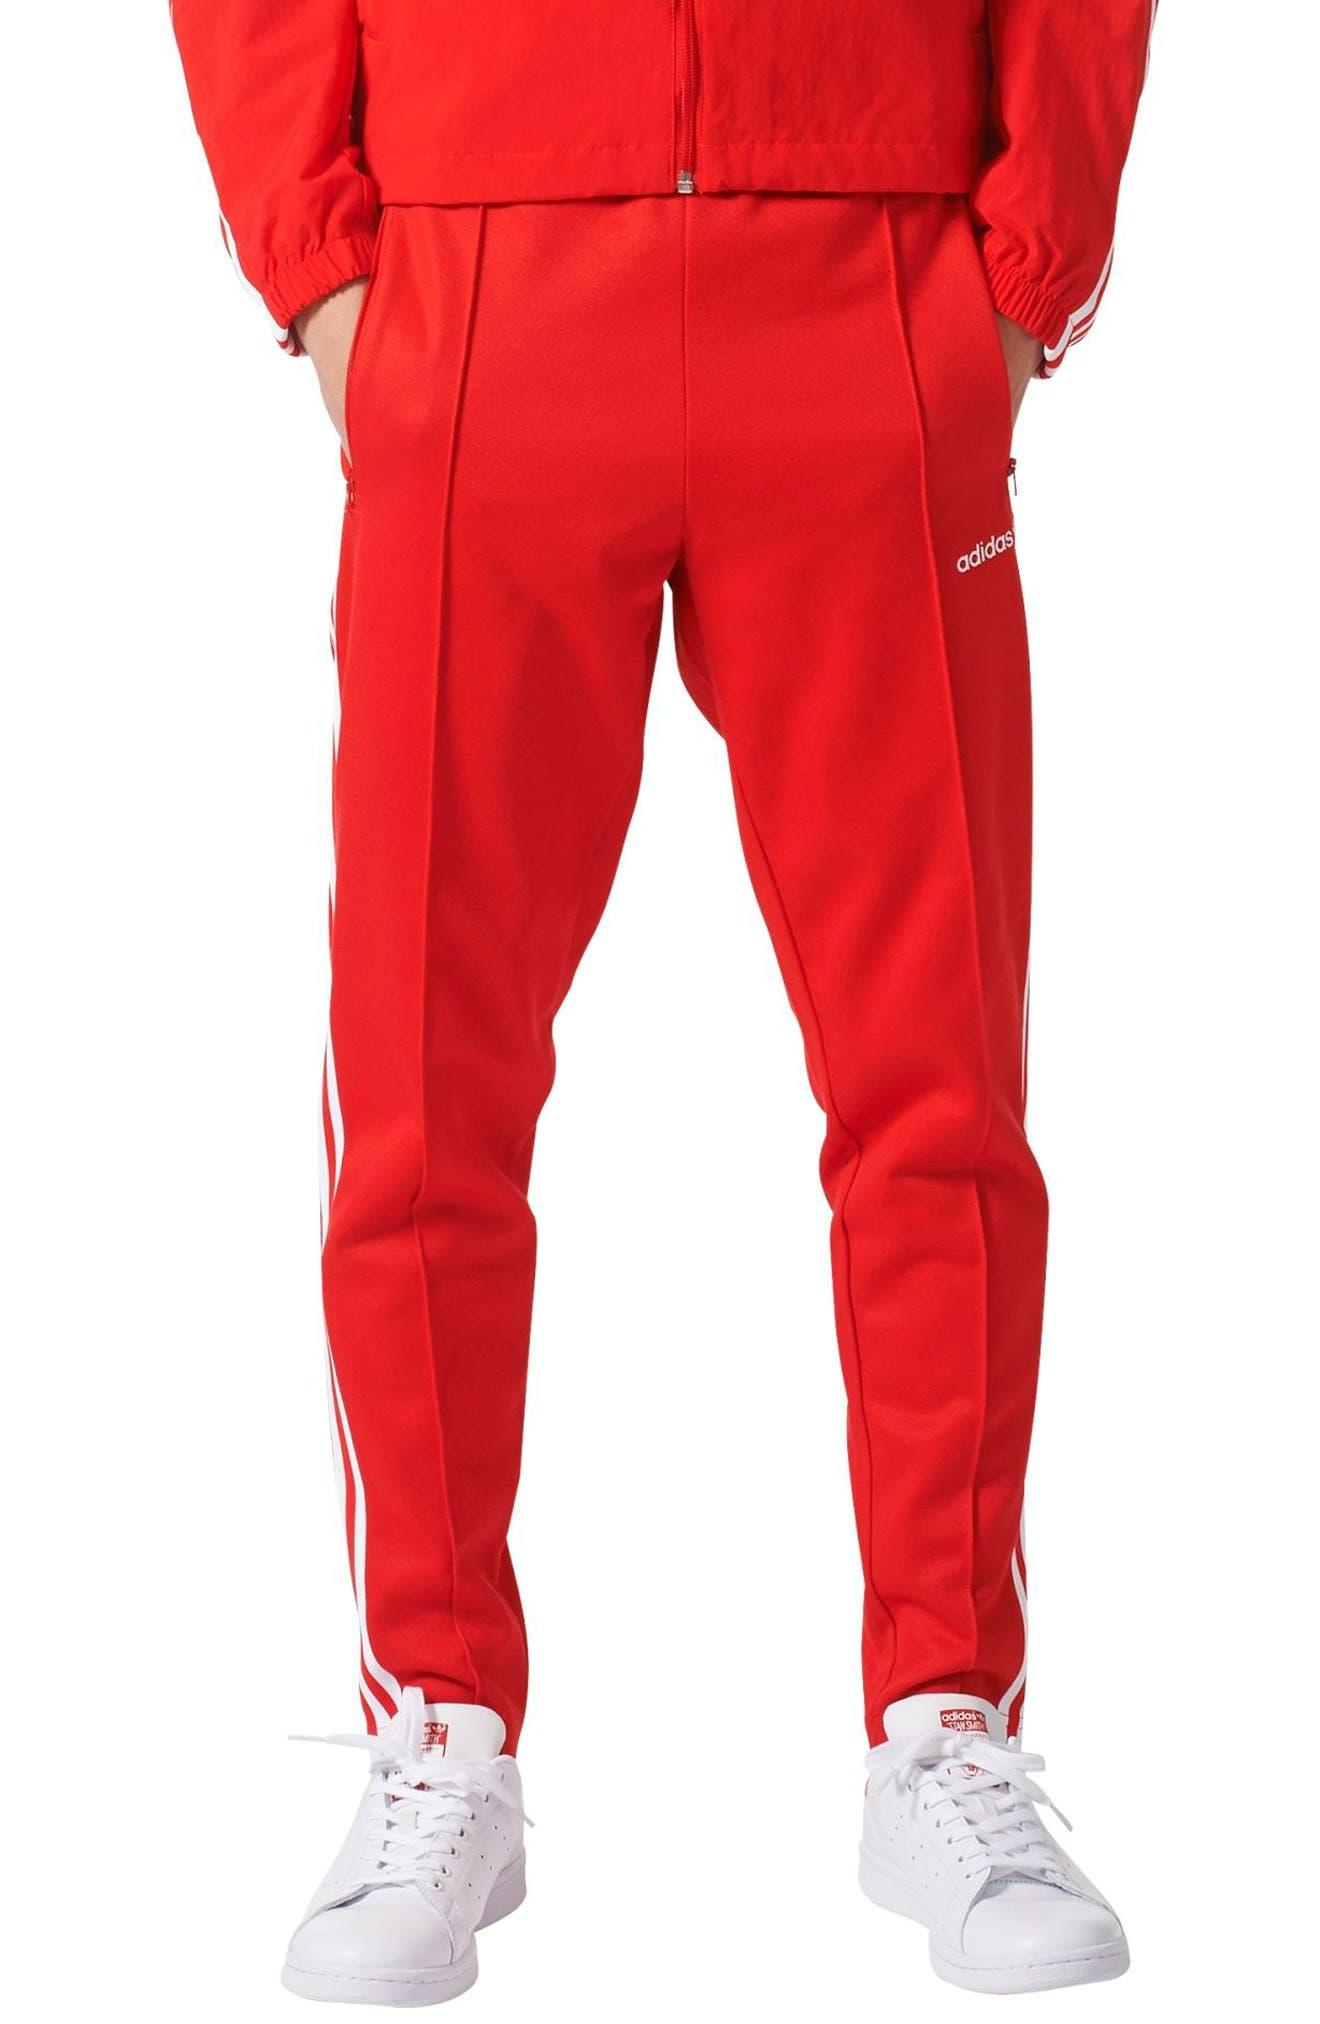 Originals Beckenbauer Track Pants,                         Main,                         color, Vivid Red